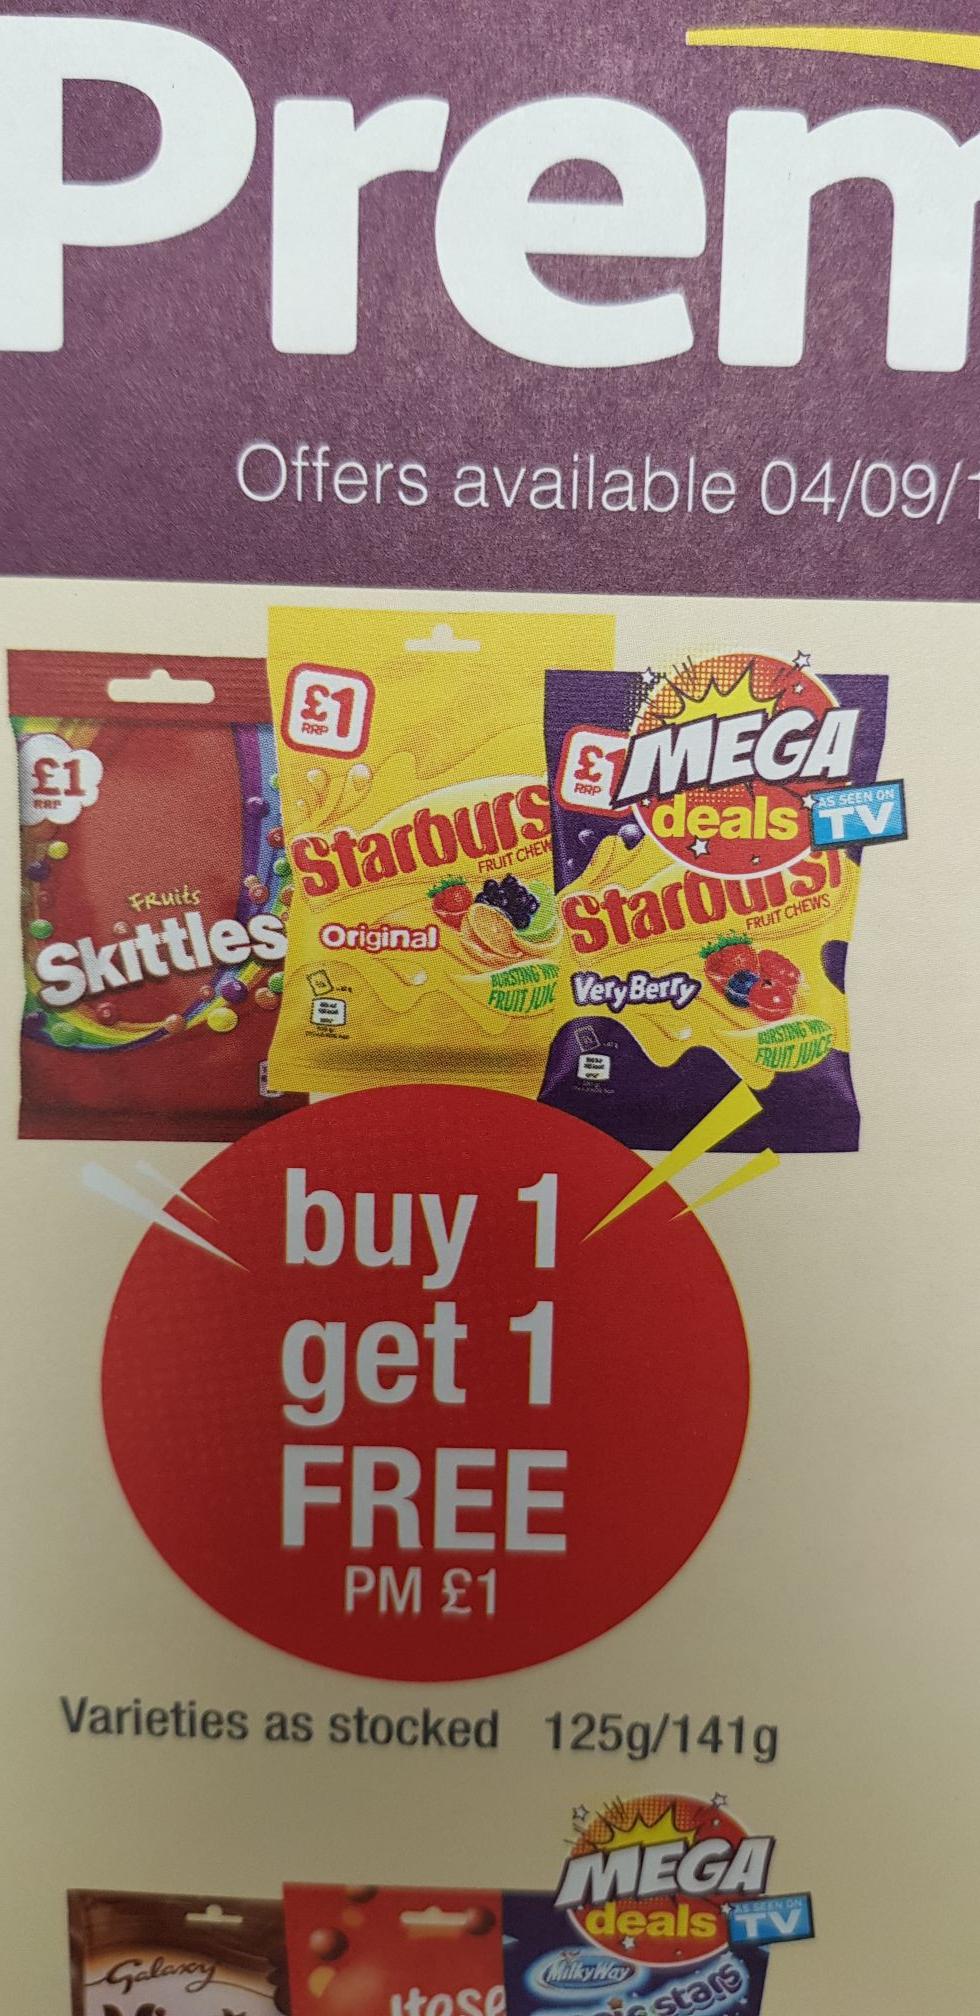 Buy 1 get 1 free - Skittles and Starburst £1 @ Premier Stores